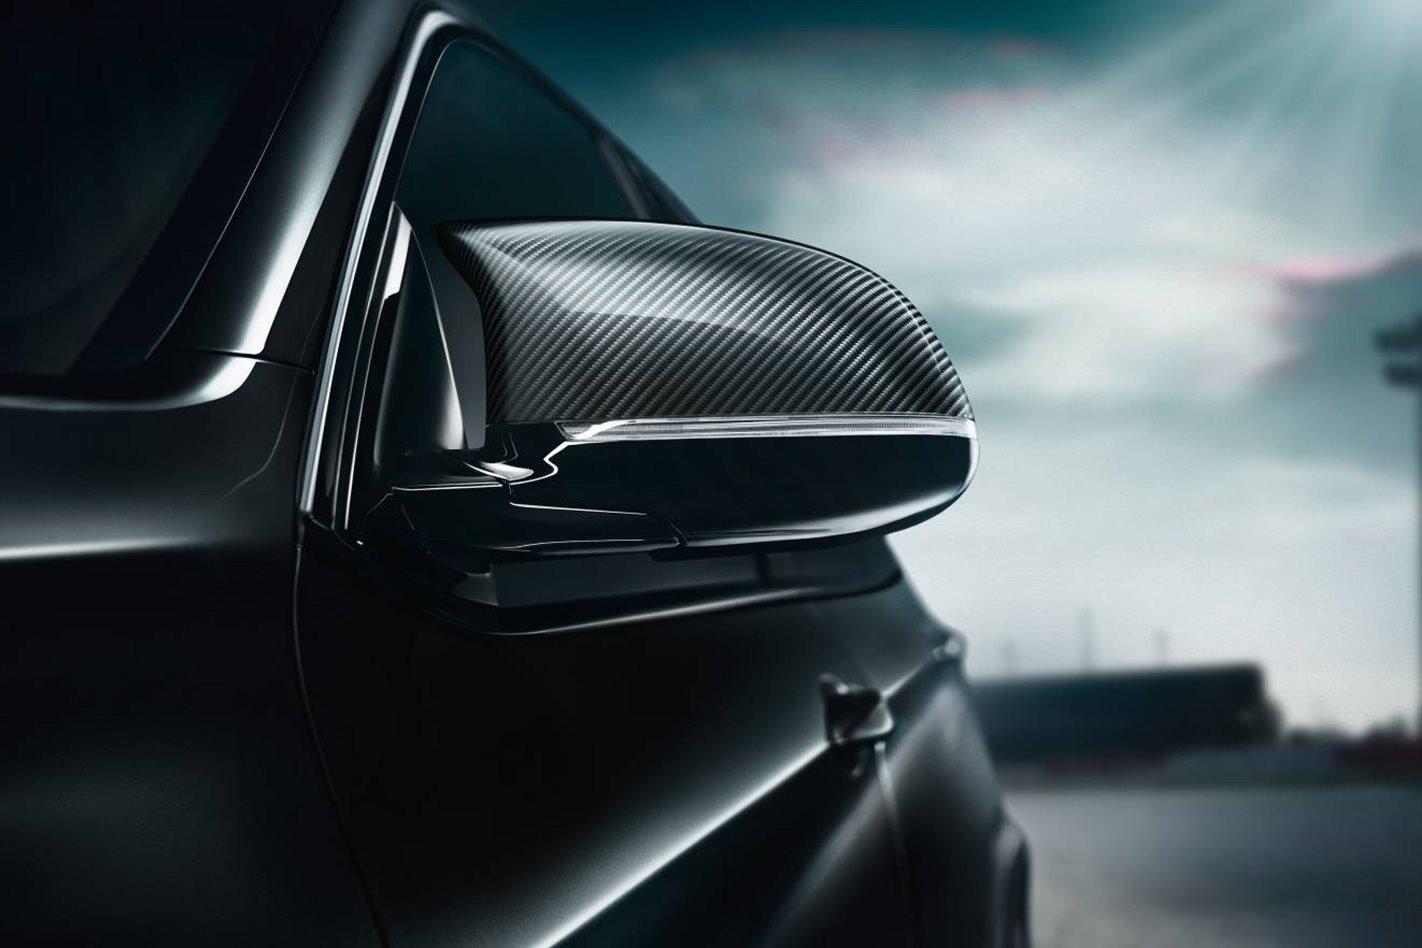 BMW X5 M and X6 M Black Fire Mirror cap